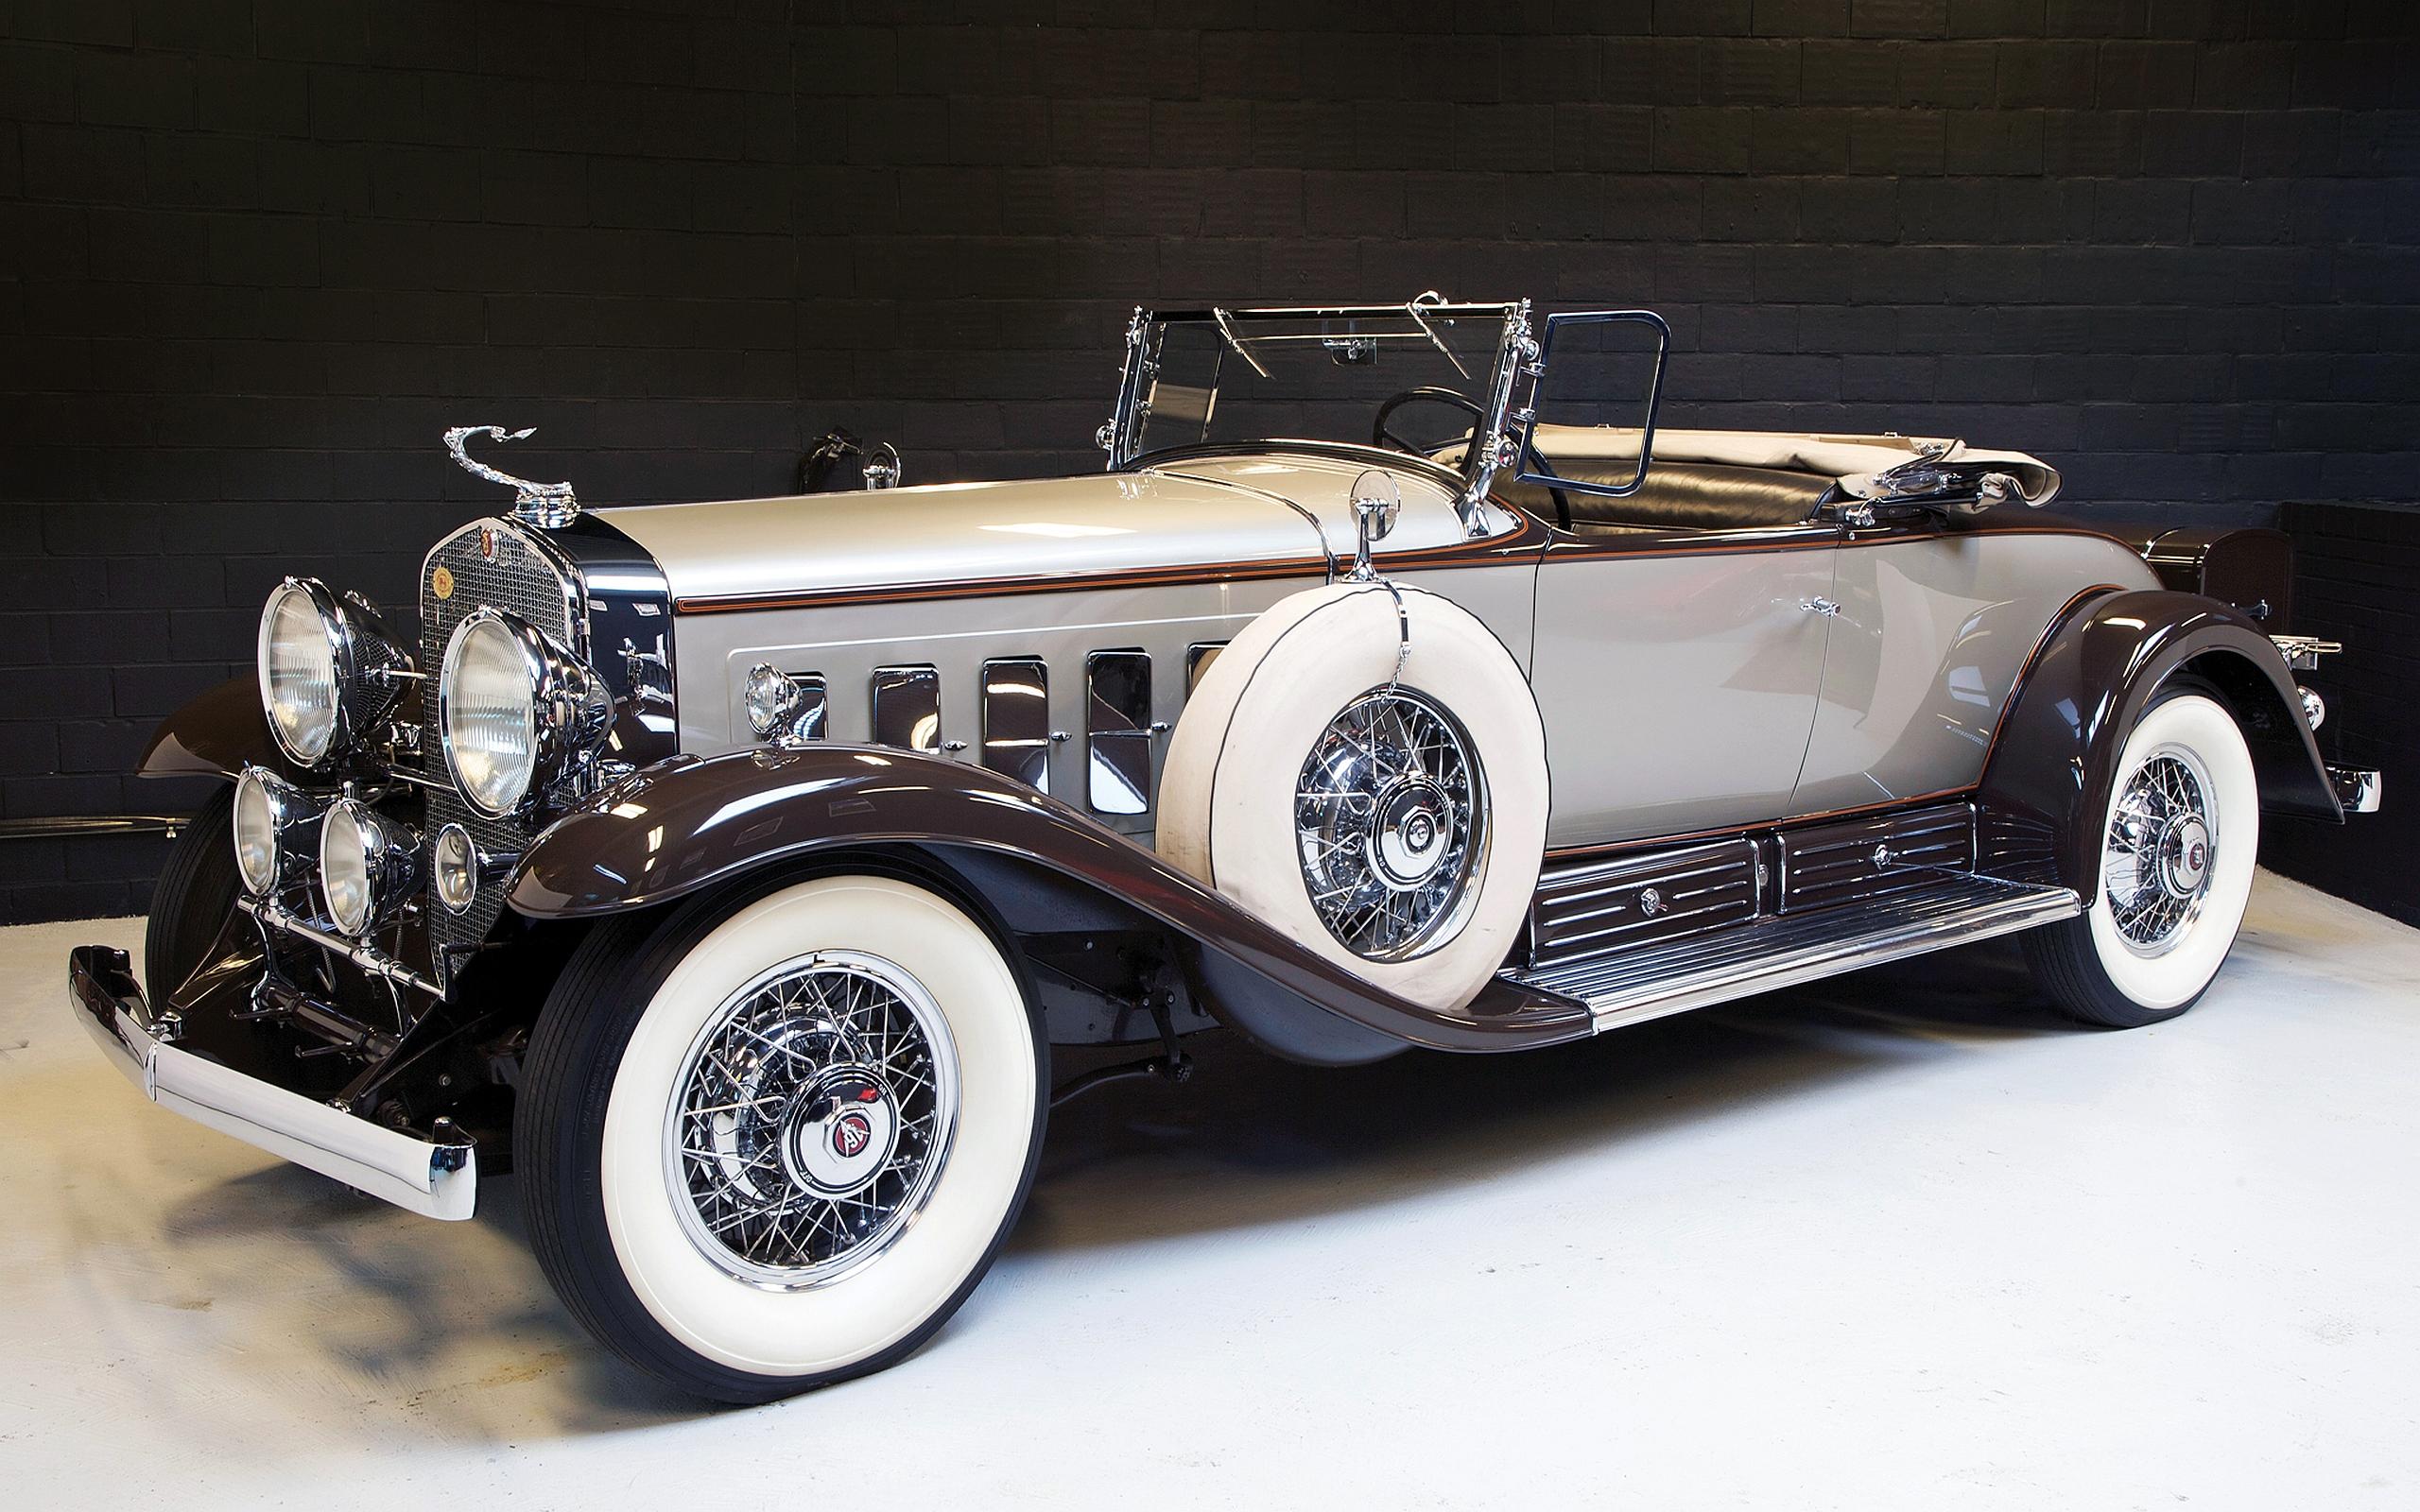 Hd Wallpaper From Samsung J2 Rolls Royce: 1930 Cadillac V16 Roadster HD Wallpaper